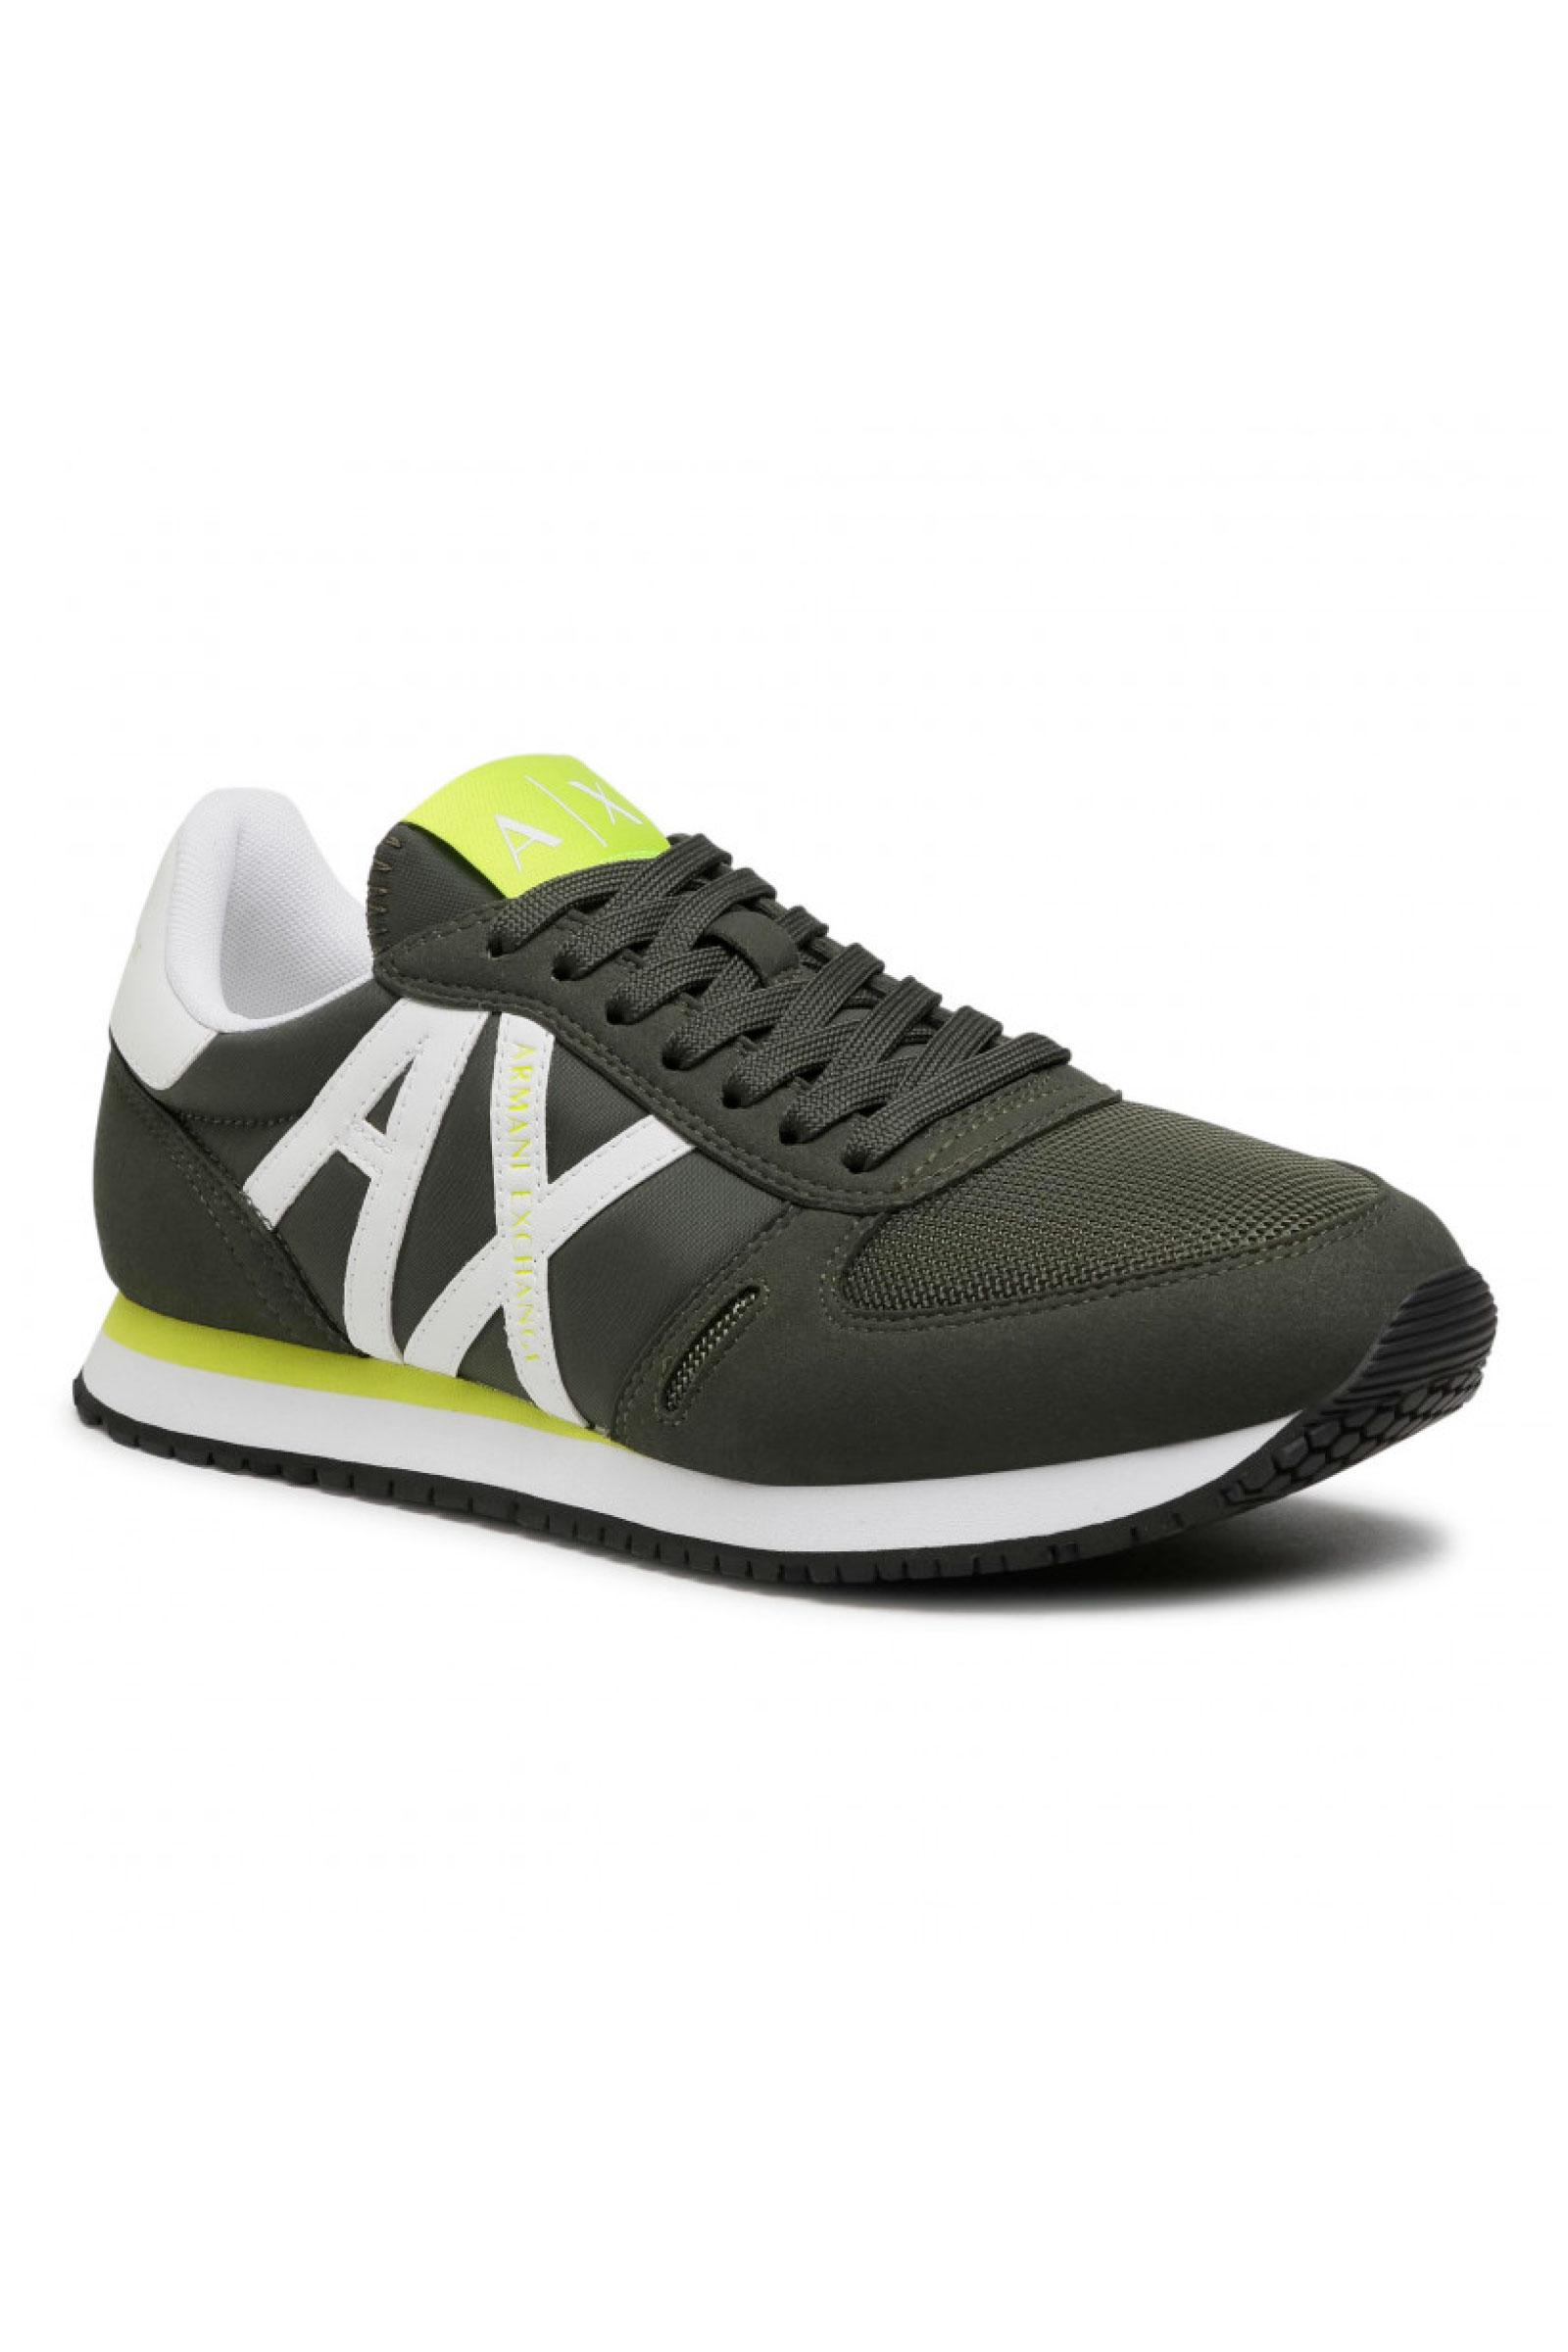 ARMANI EXCHANGE Men's Shoes ARMANI EXCHANGE   Shoes   XUX017 XCC68K530